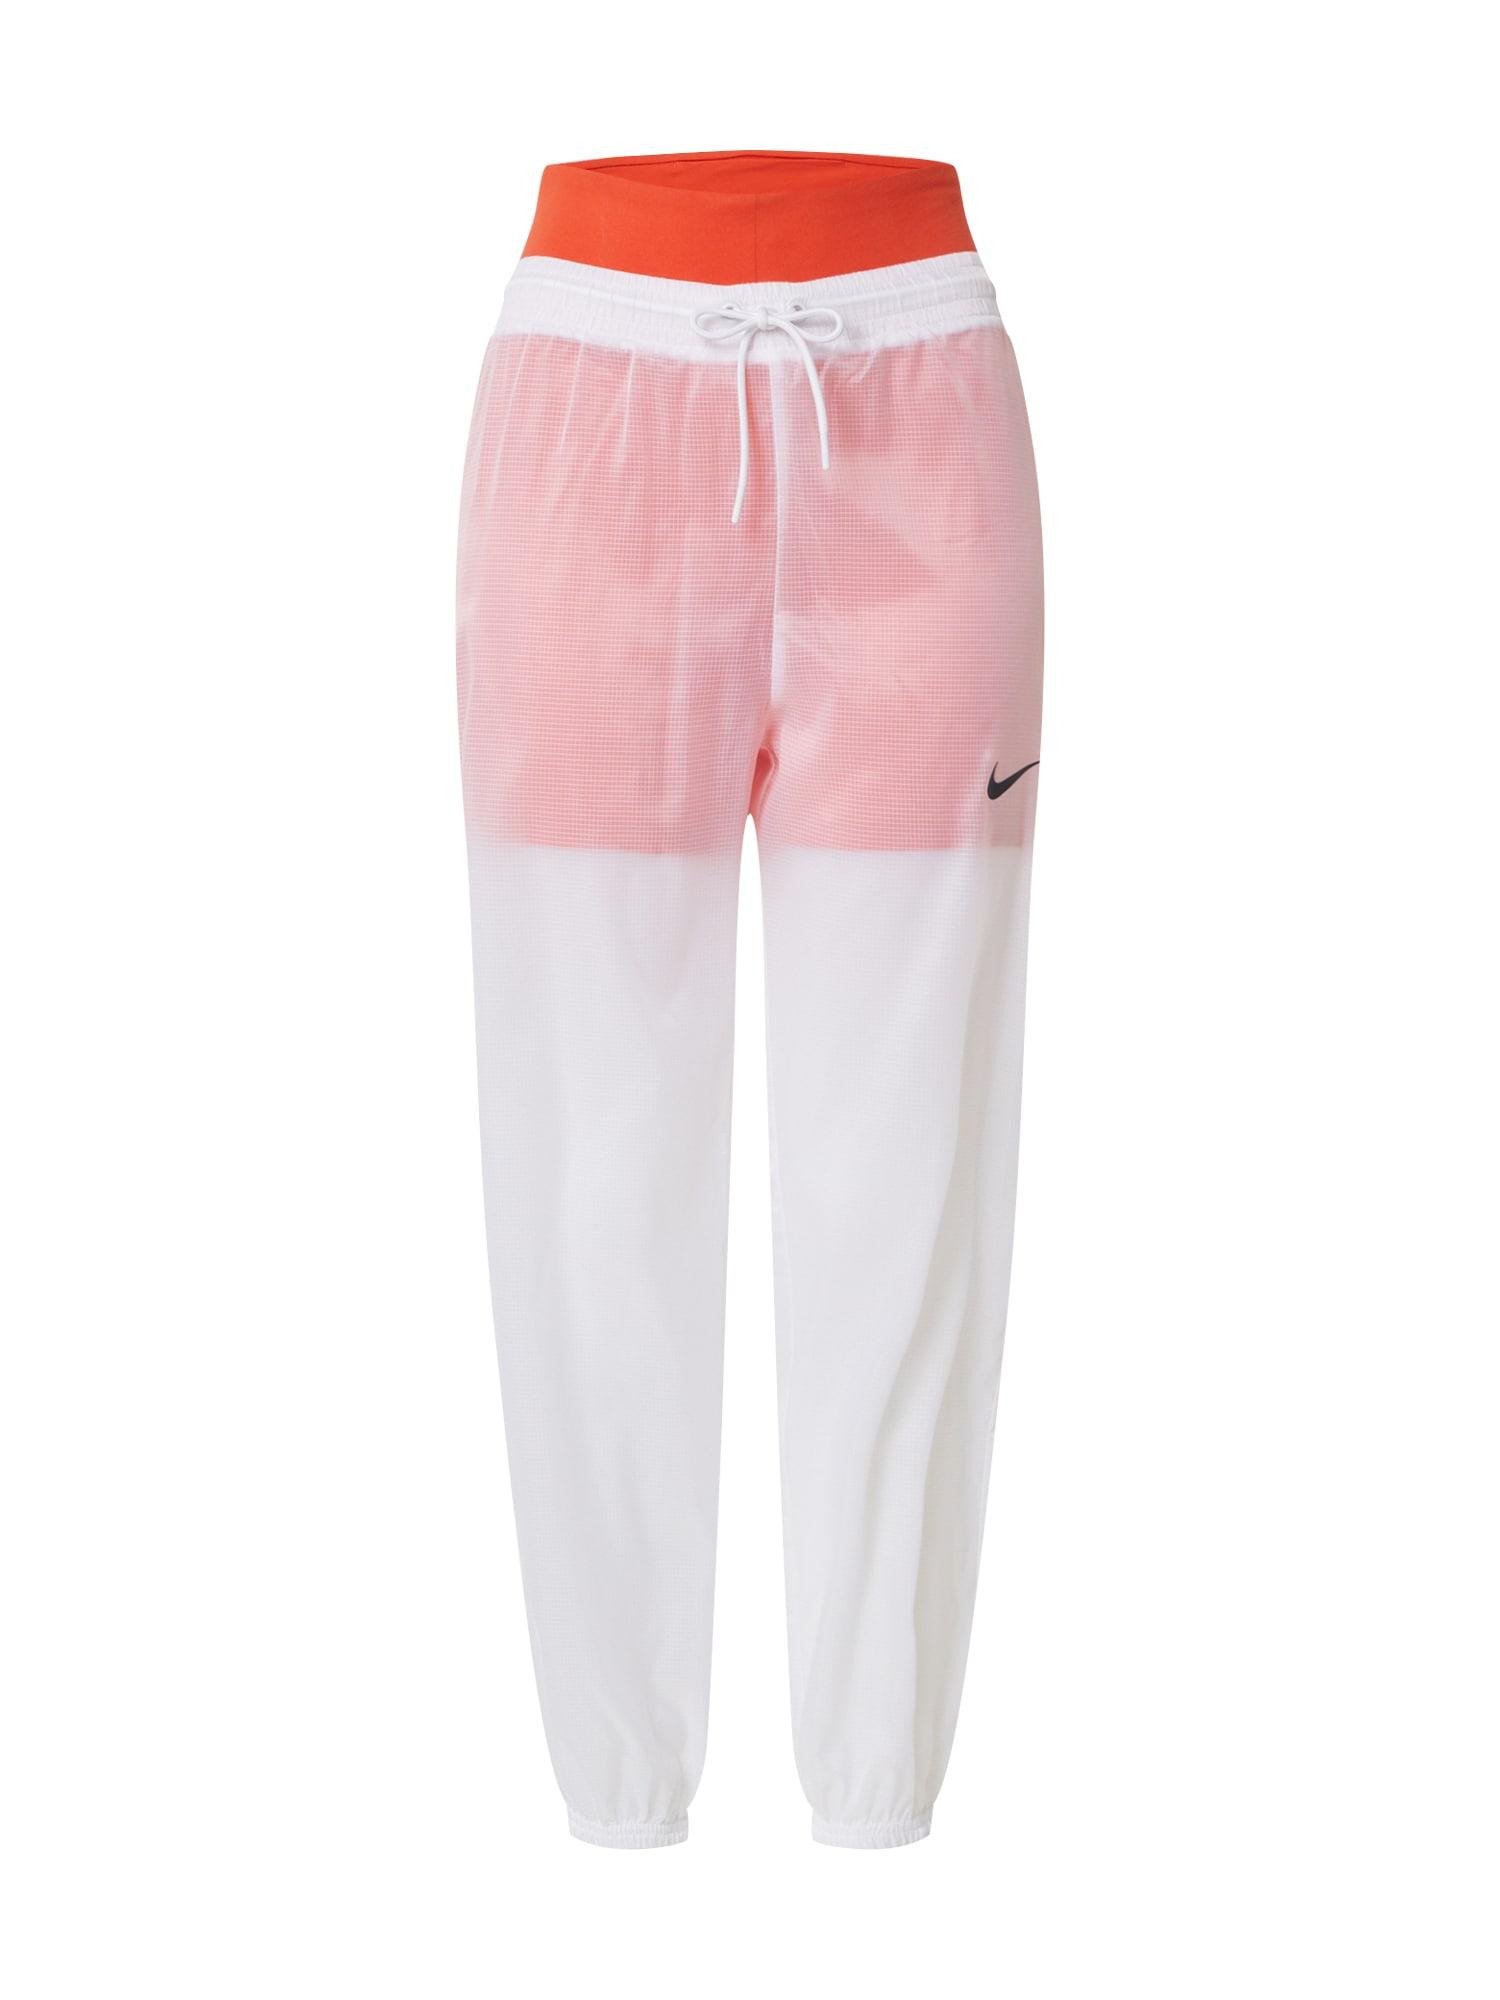 Nike Sportswear Kalhoty  bílá / oranžová